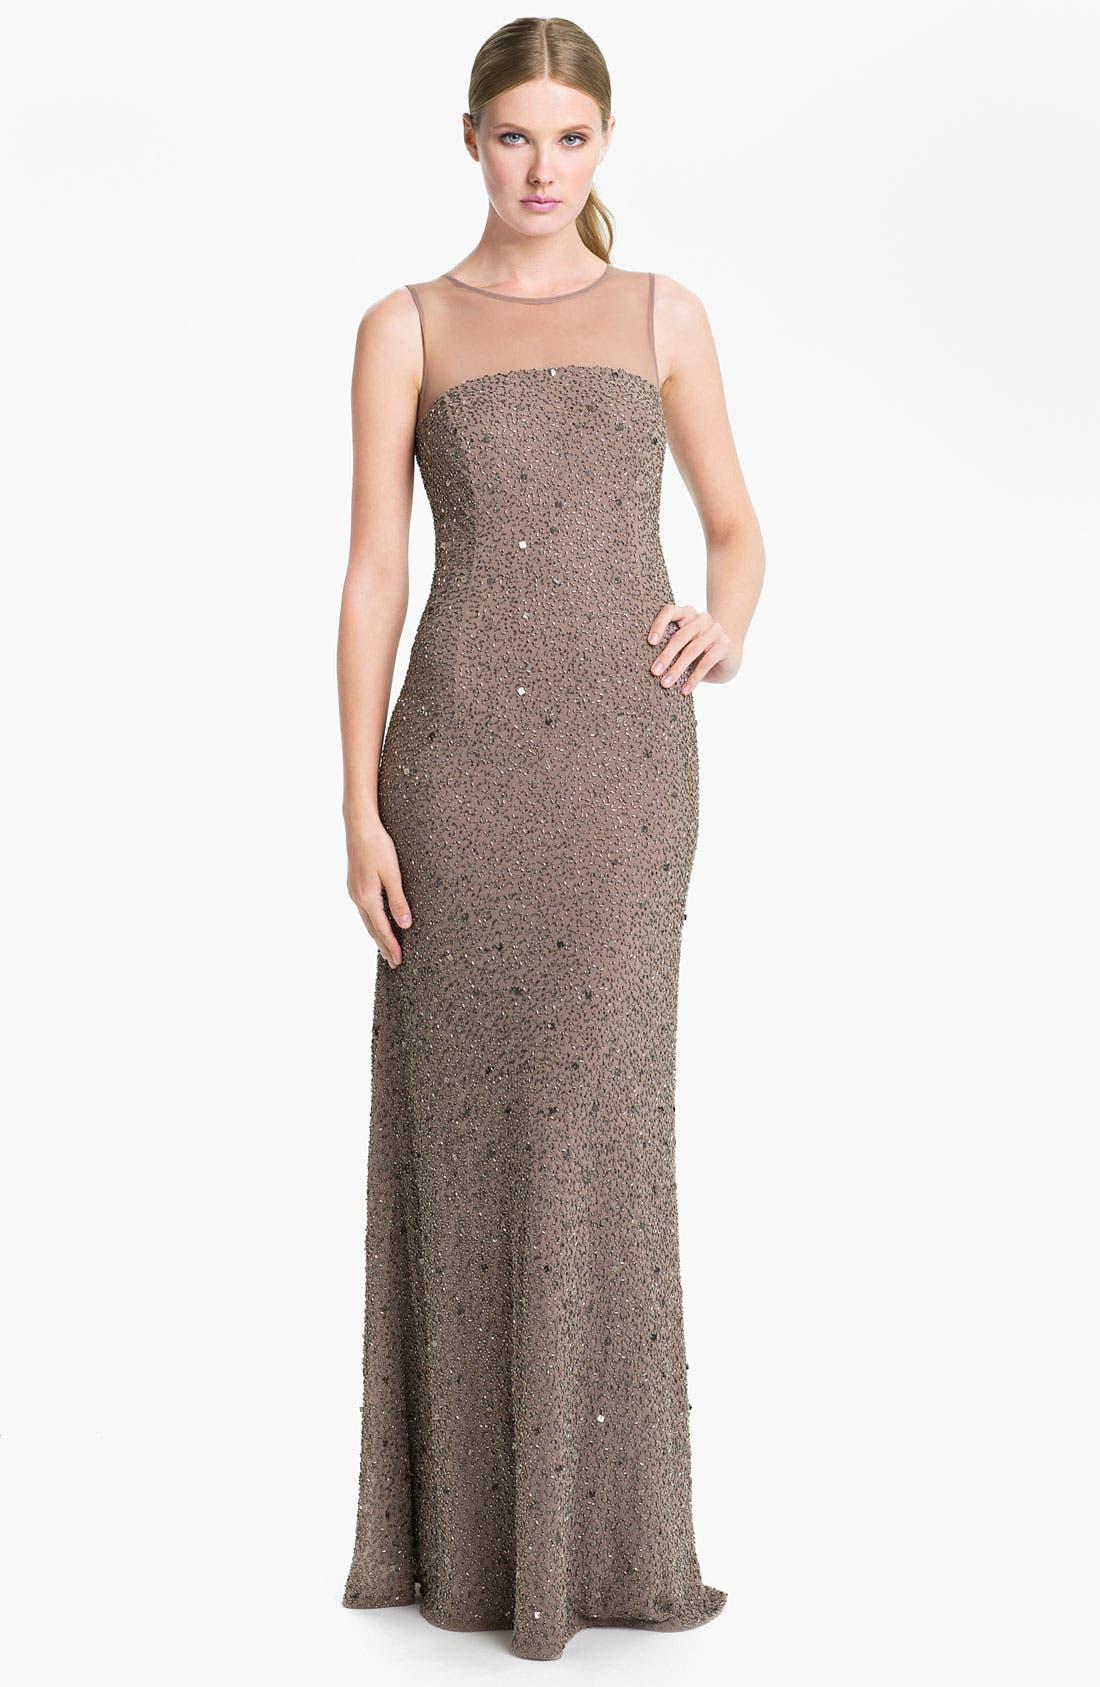 Alternate Image 1 Selected - Adrianna Papell Illusion Yoke Embellished Chiffon Gown